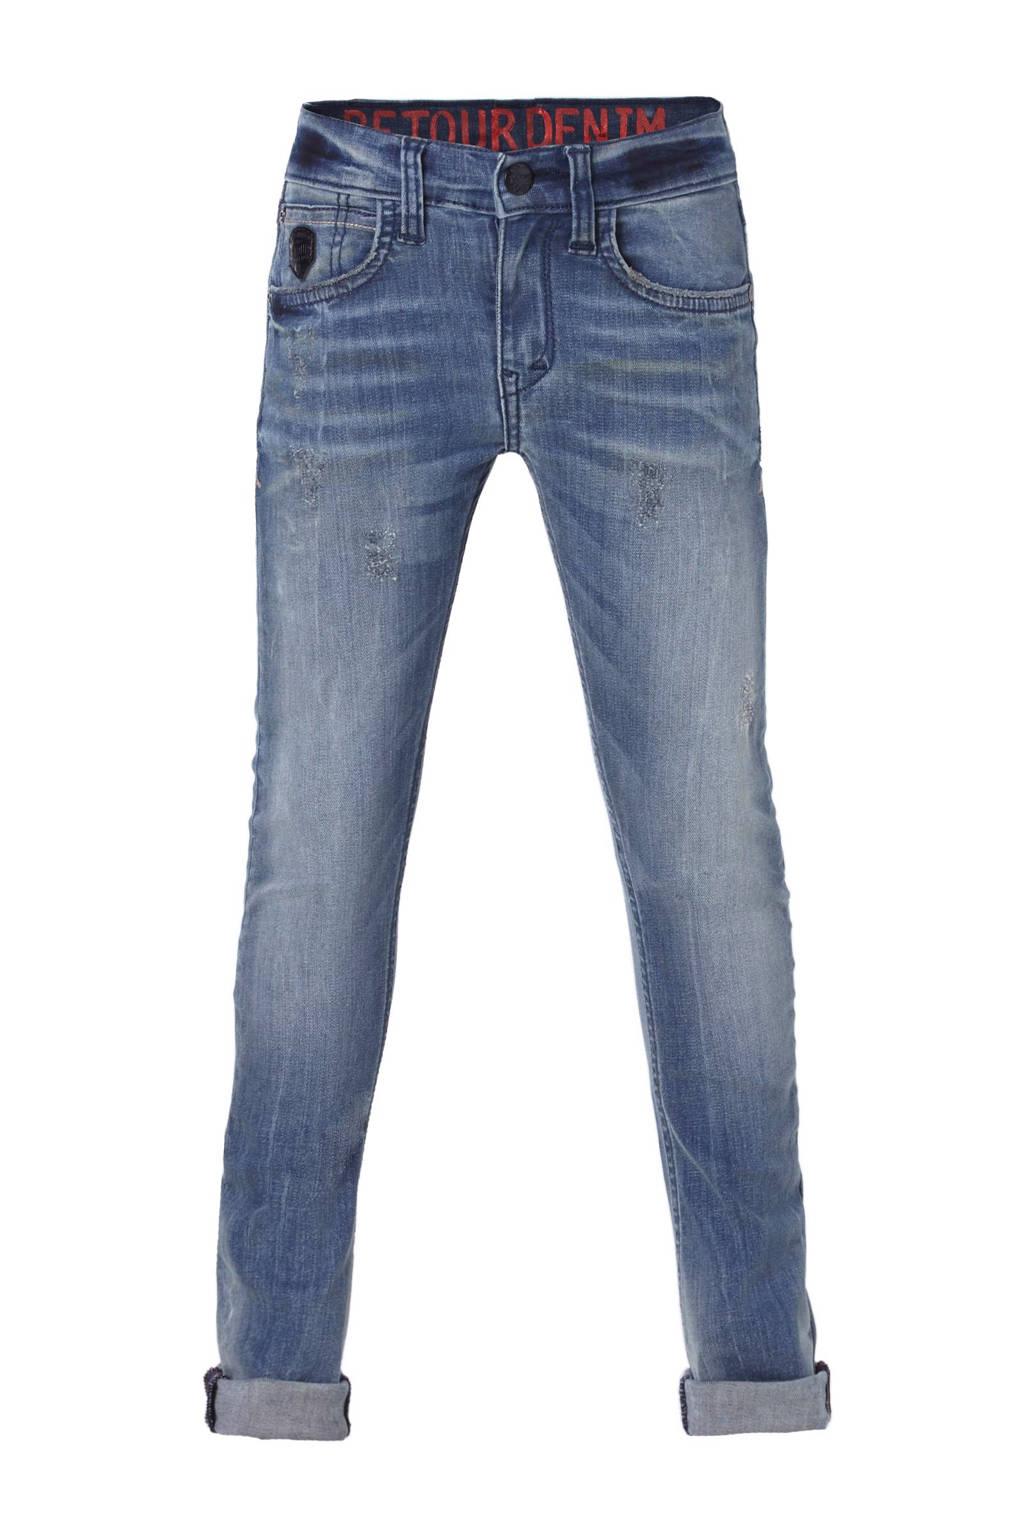 5a43b3e2948c1c Retour Denim Zeger super skinny fit jeans